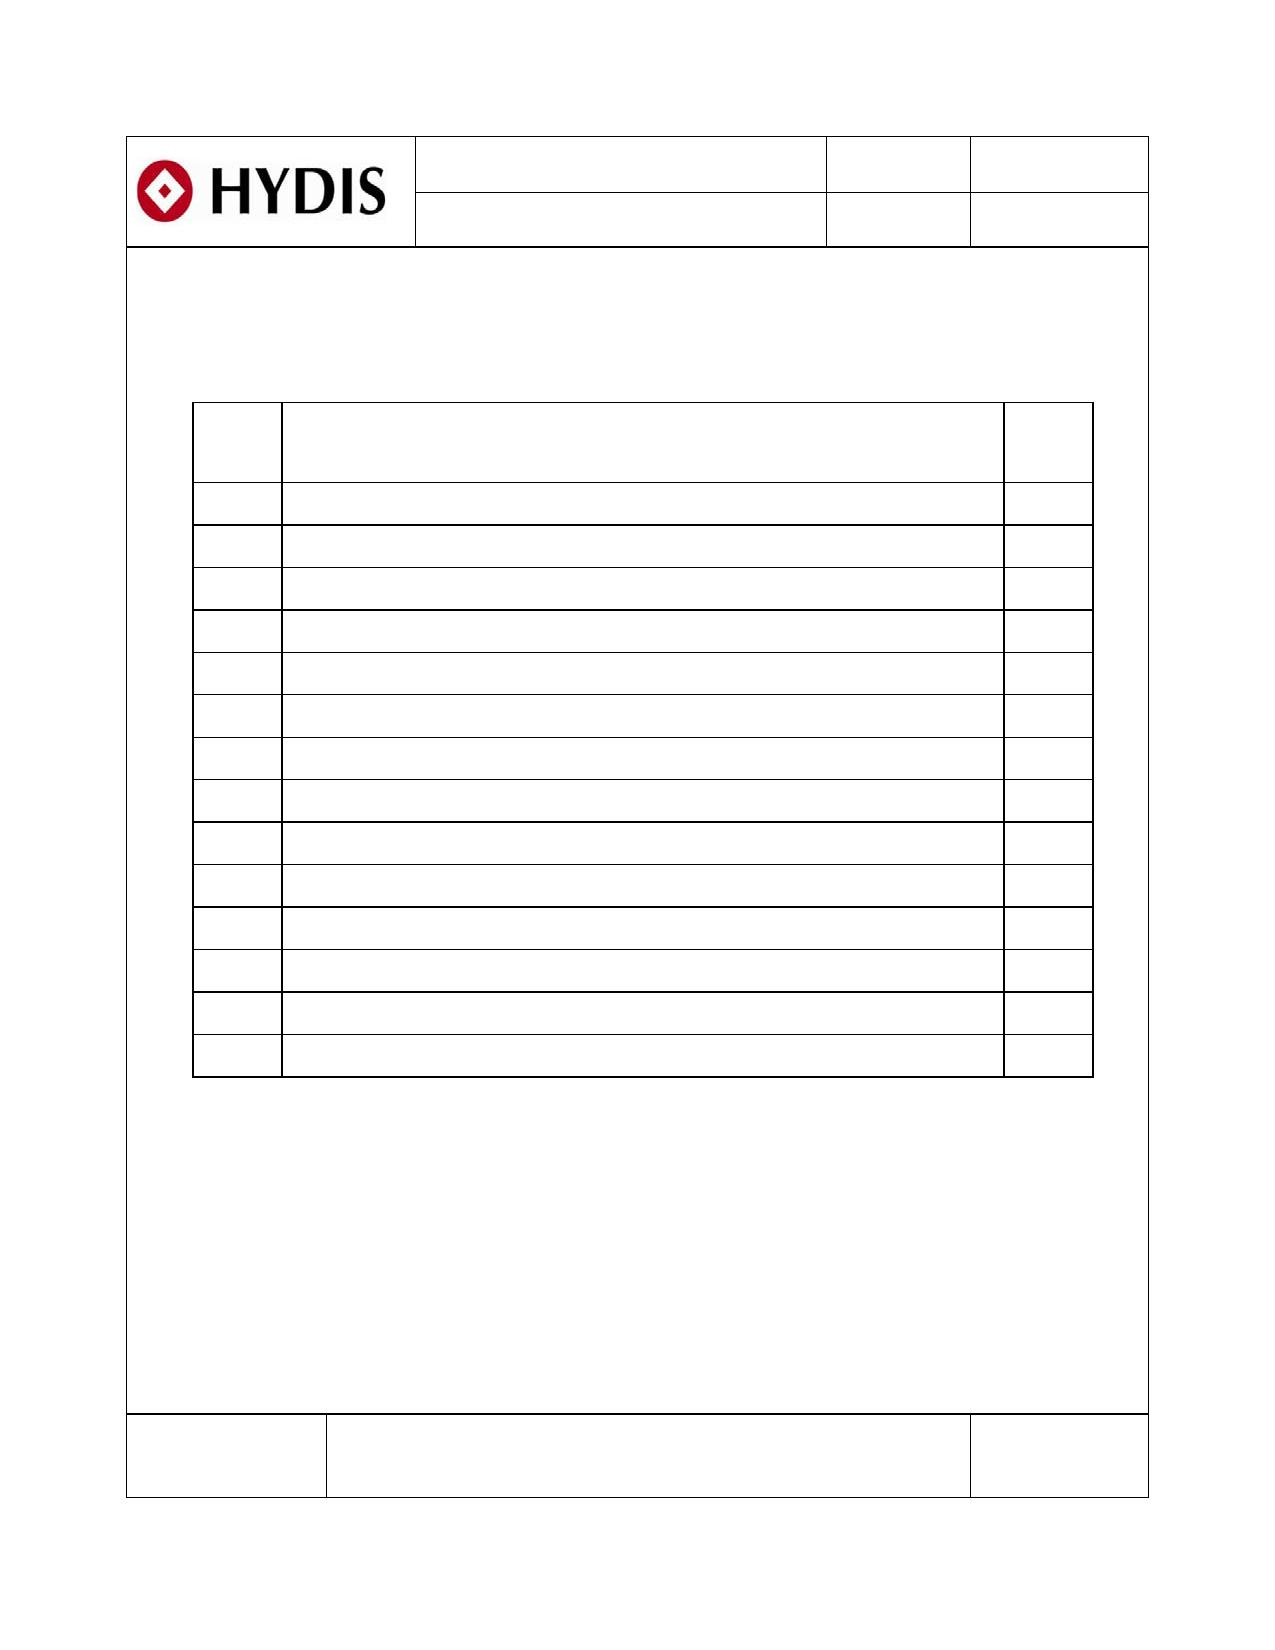 HV121WX5-114 pdf, ピン配列